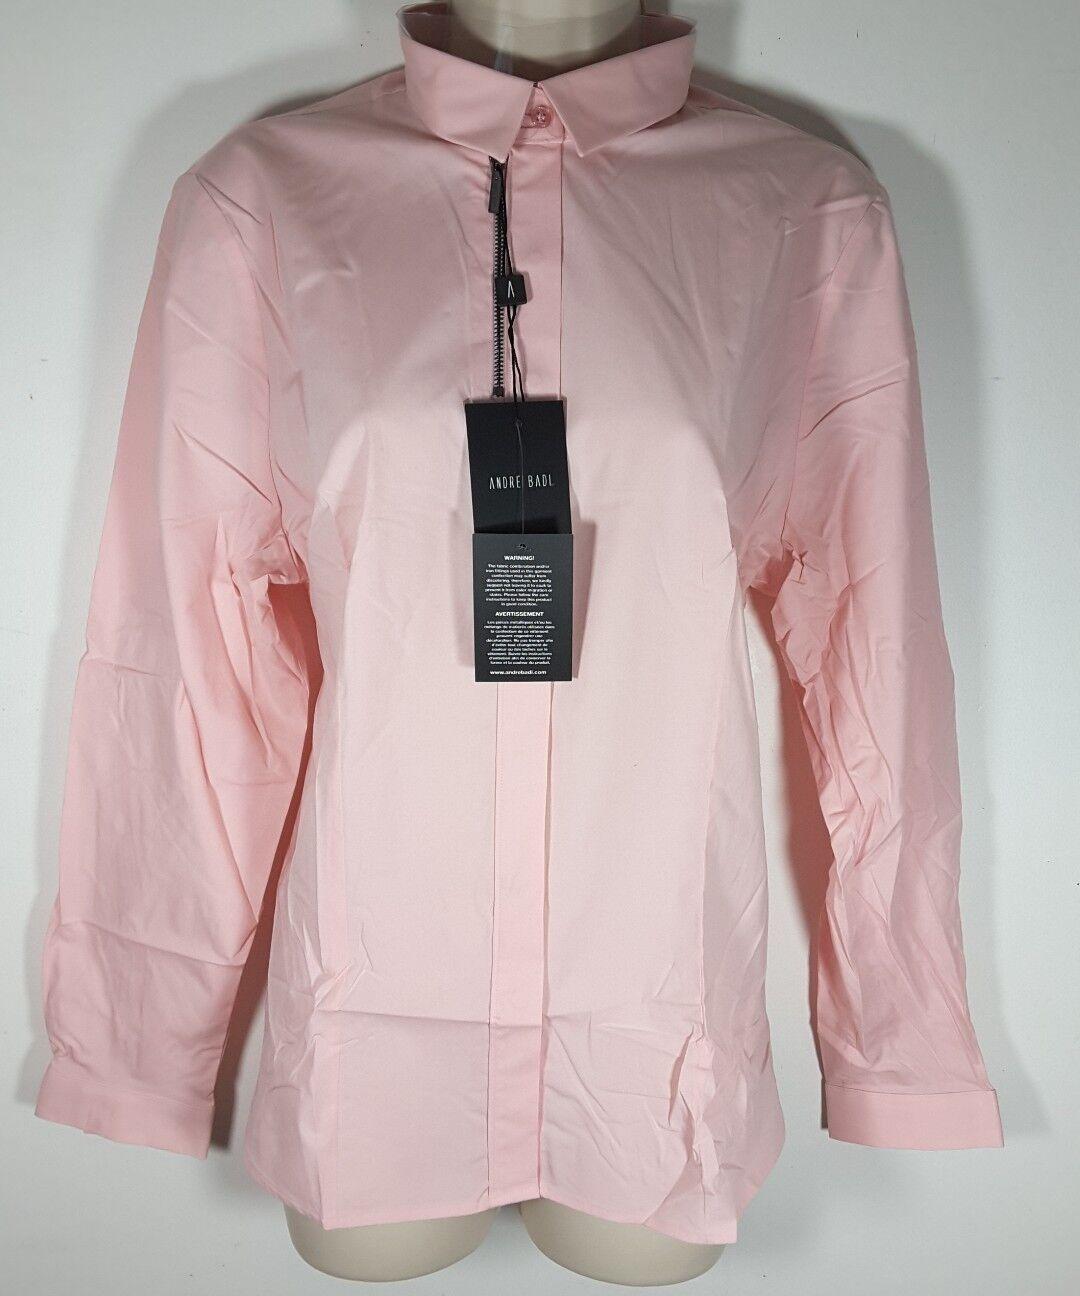 Andre Badi Camisas Rosa Loto Woherren Dress Shirt Rosa Multiple Größes